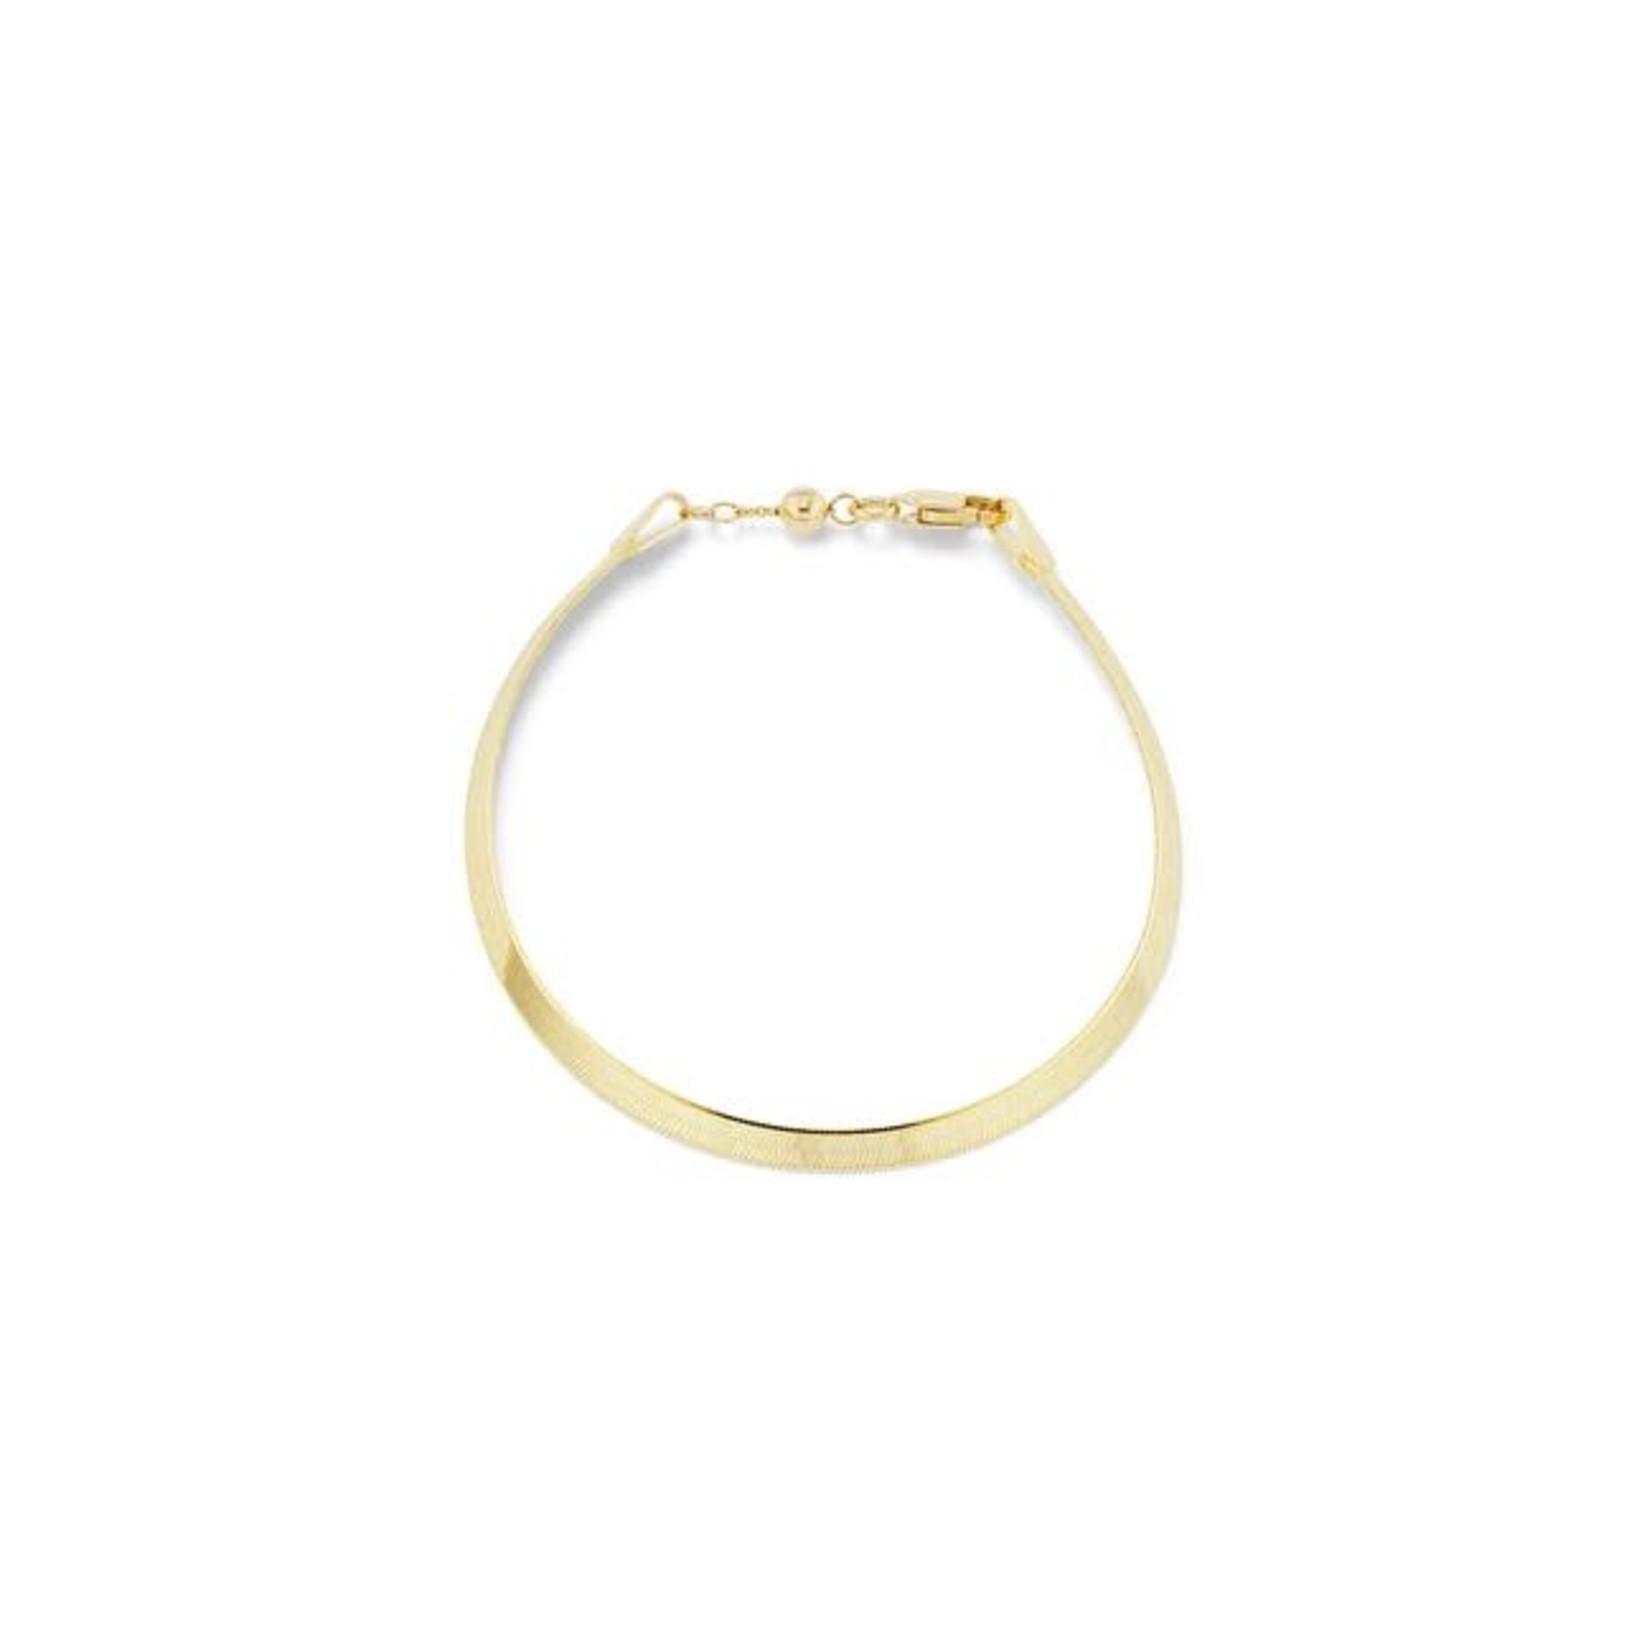 KBH Jewels Liquid Gold Herringbone Bracelet